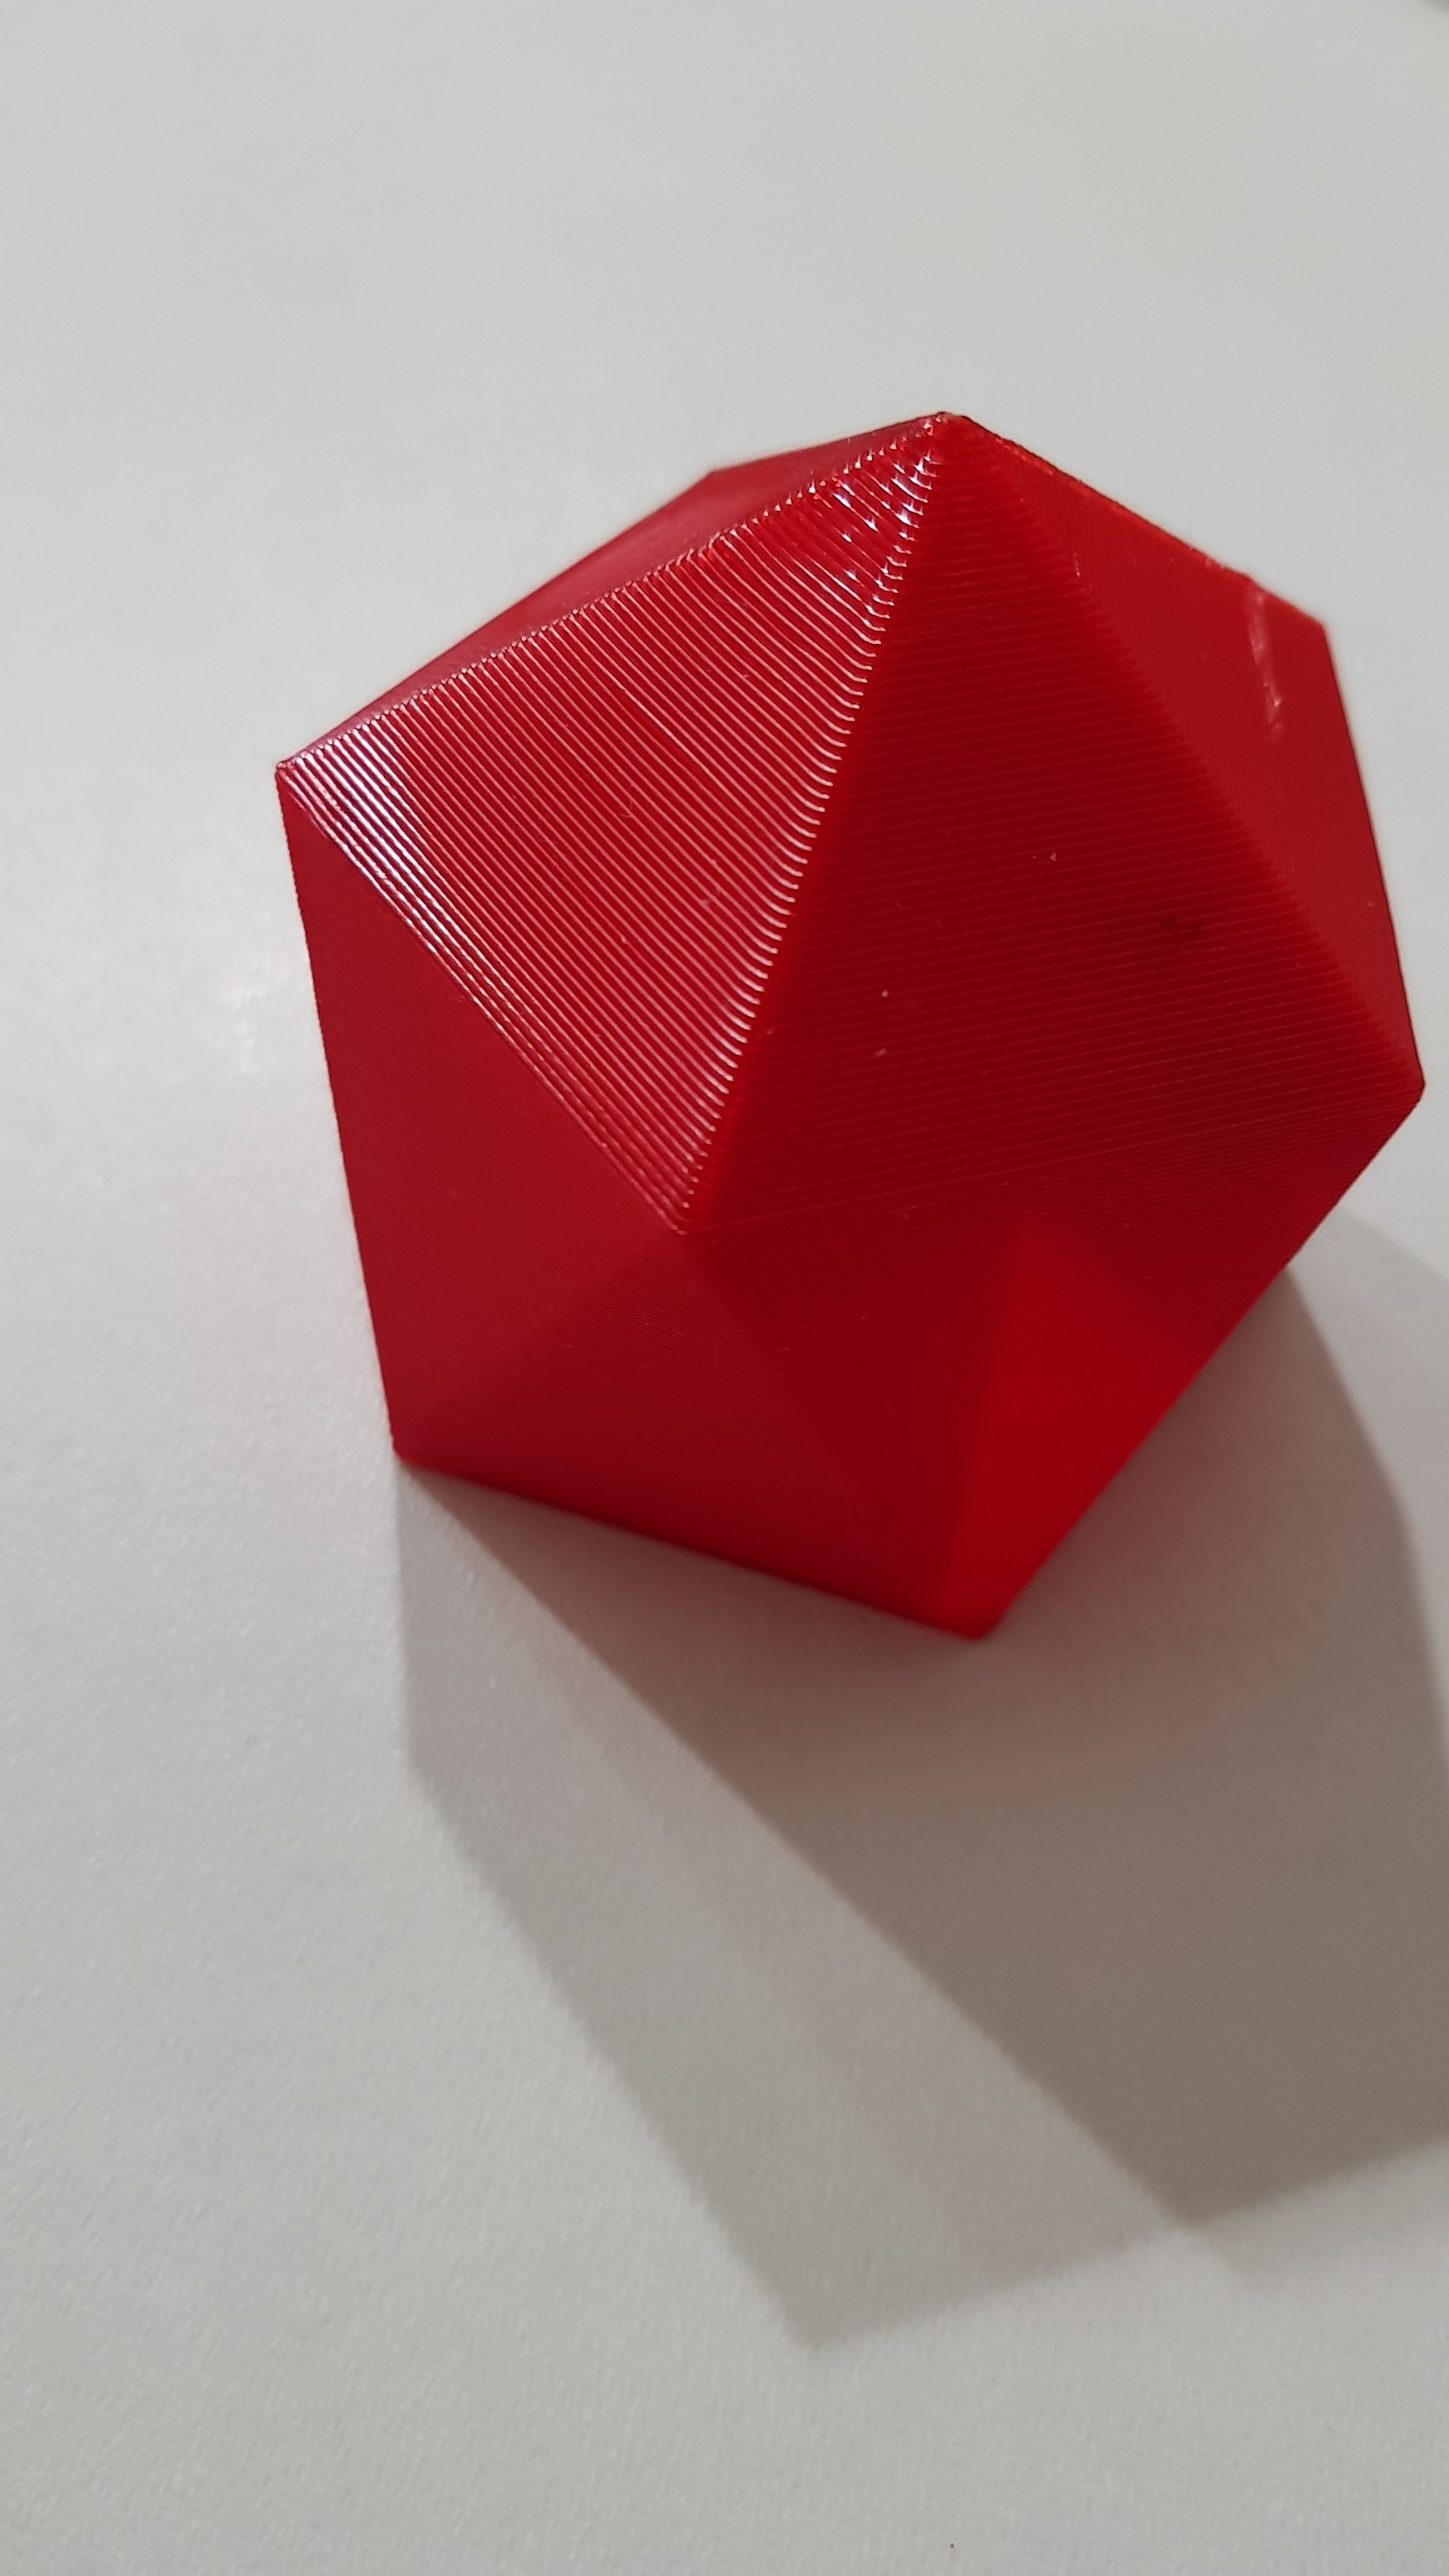 20180213_185622.jpg Download free STL file Mini planter • 3D printing design, solunkejagruti